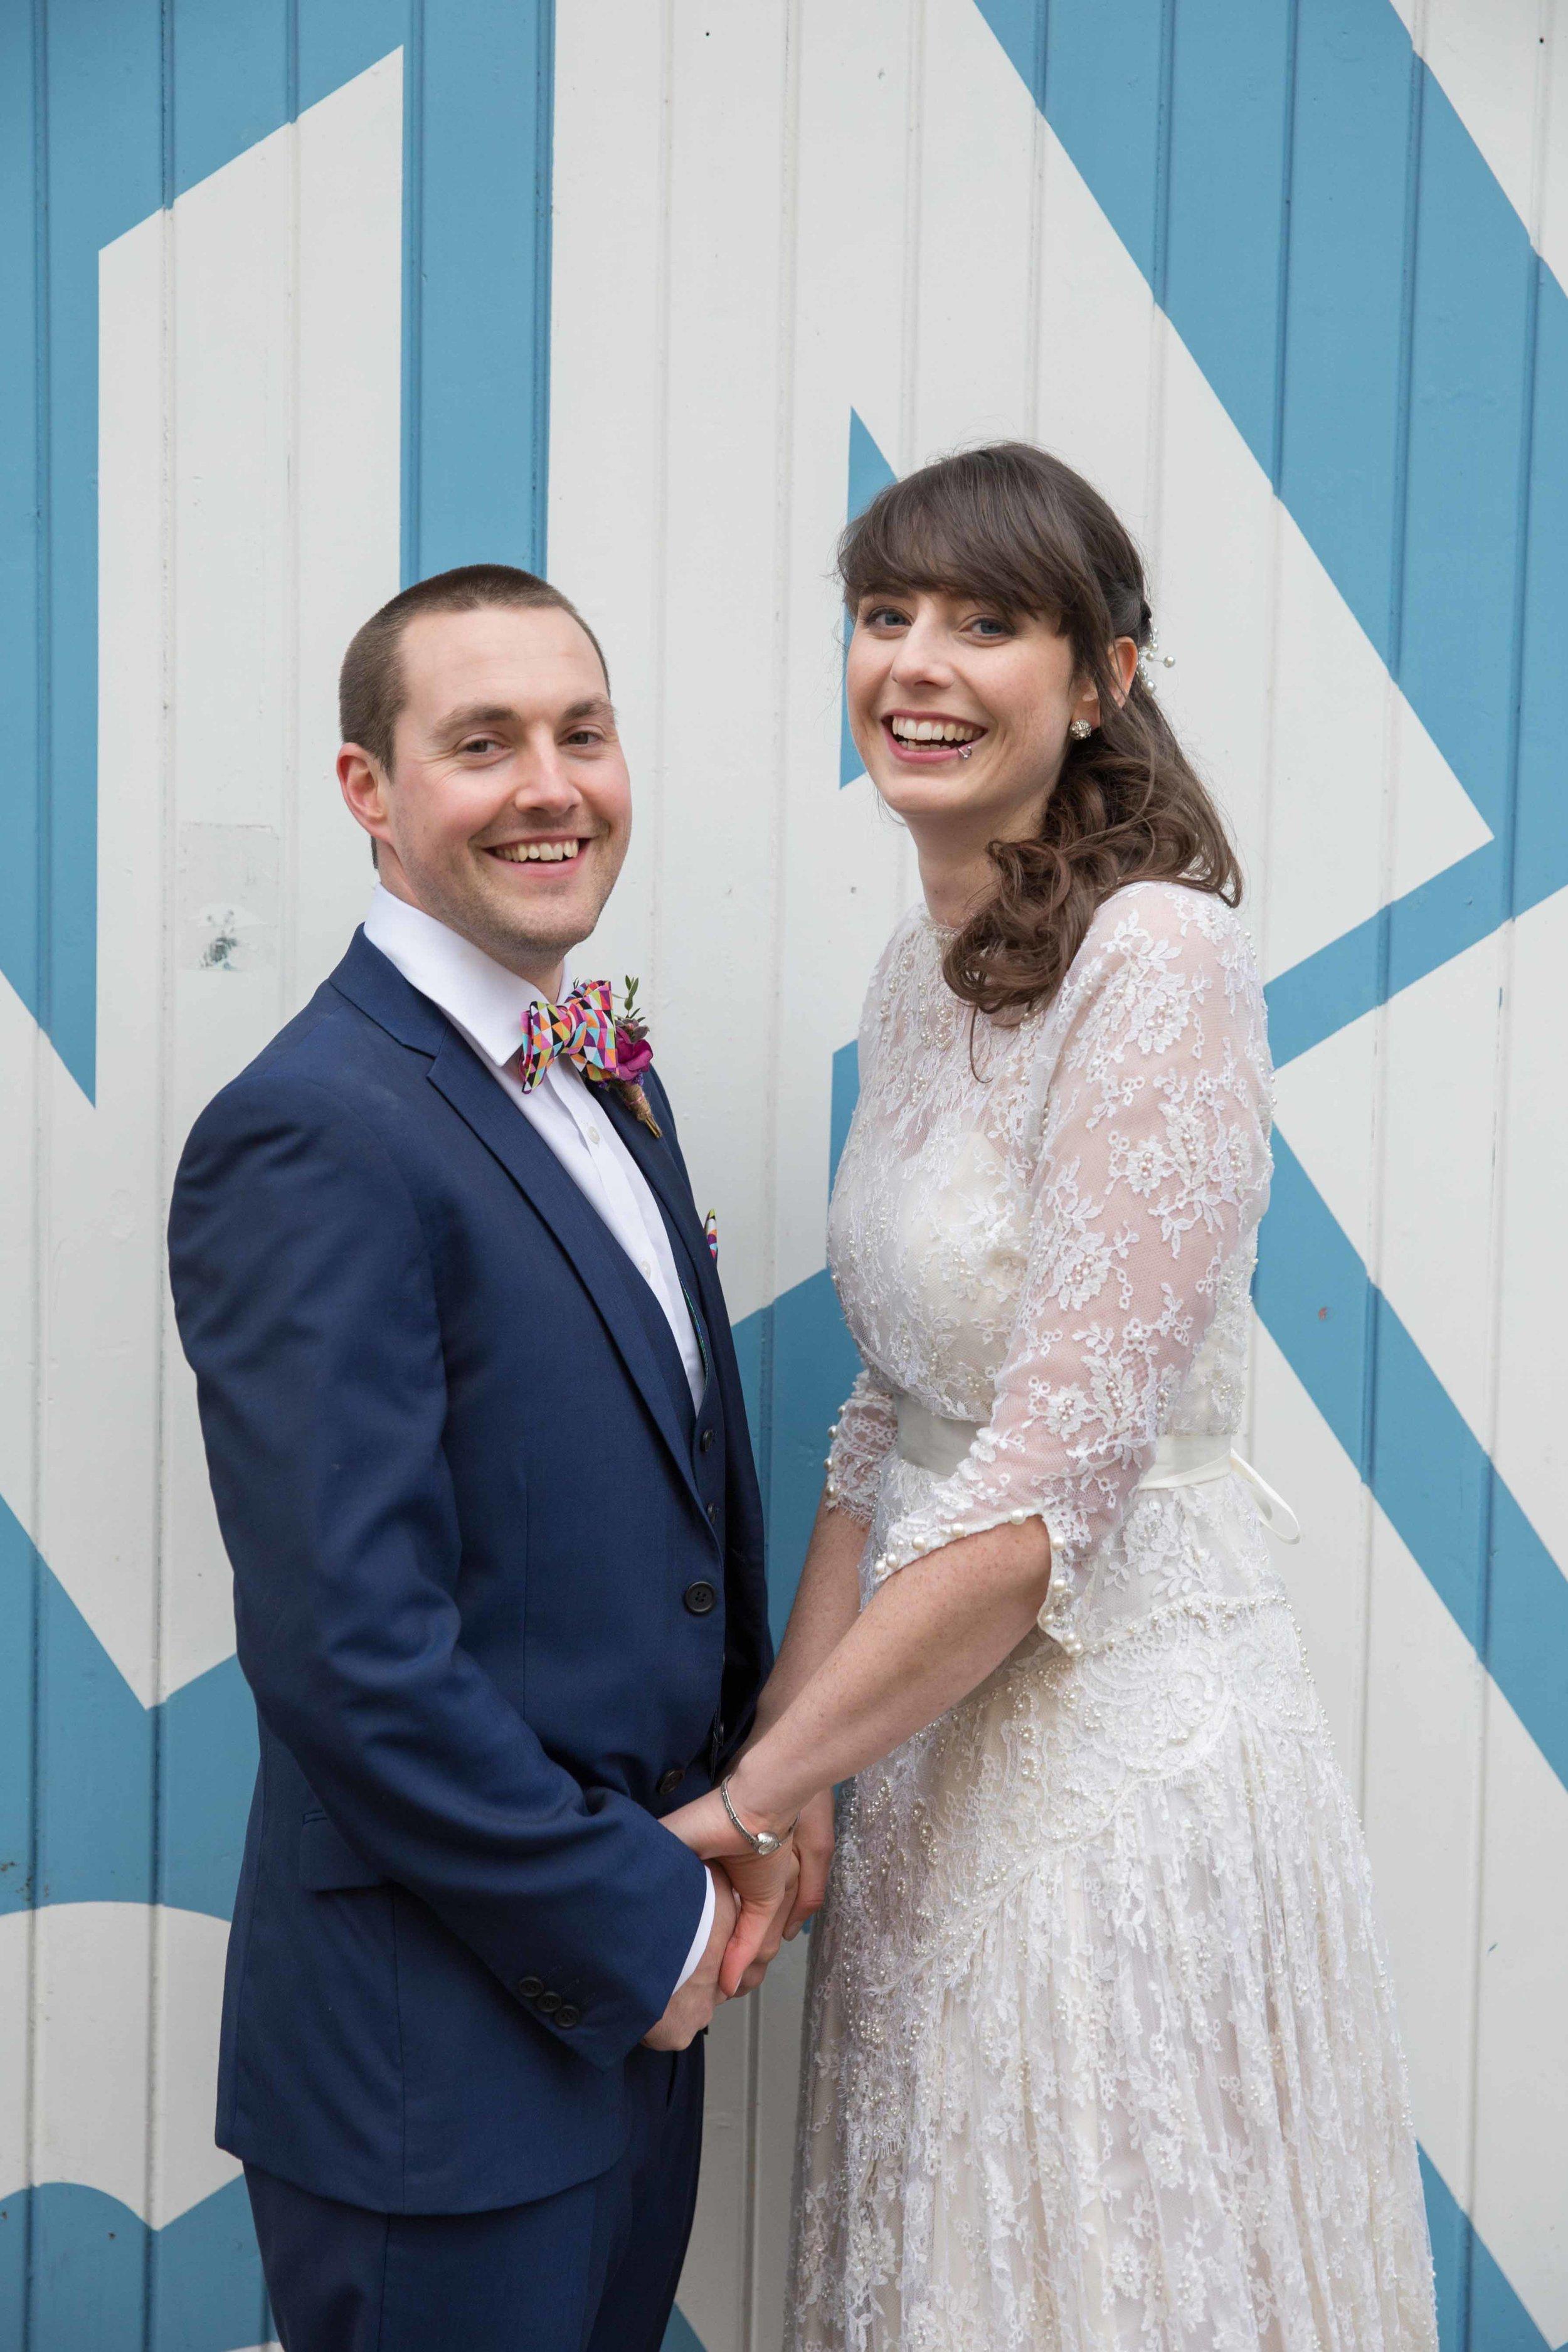 Adam & Faye - Wright Wedding Photography - Bristol Wedding Photographer -256.jpg